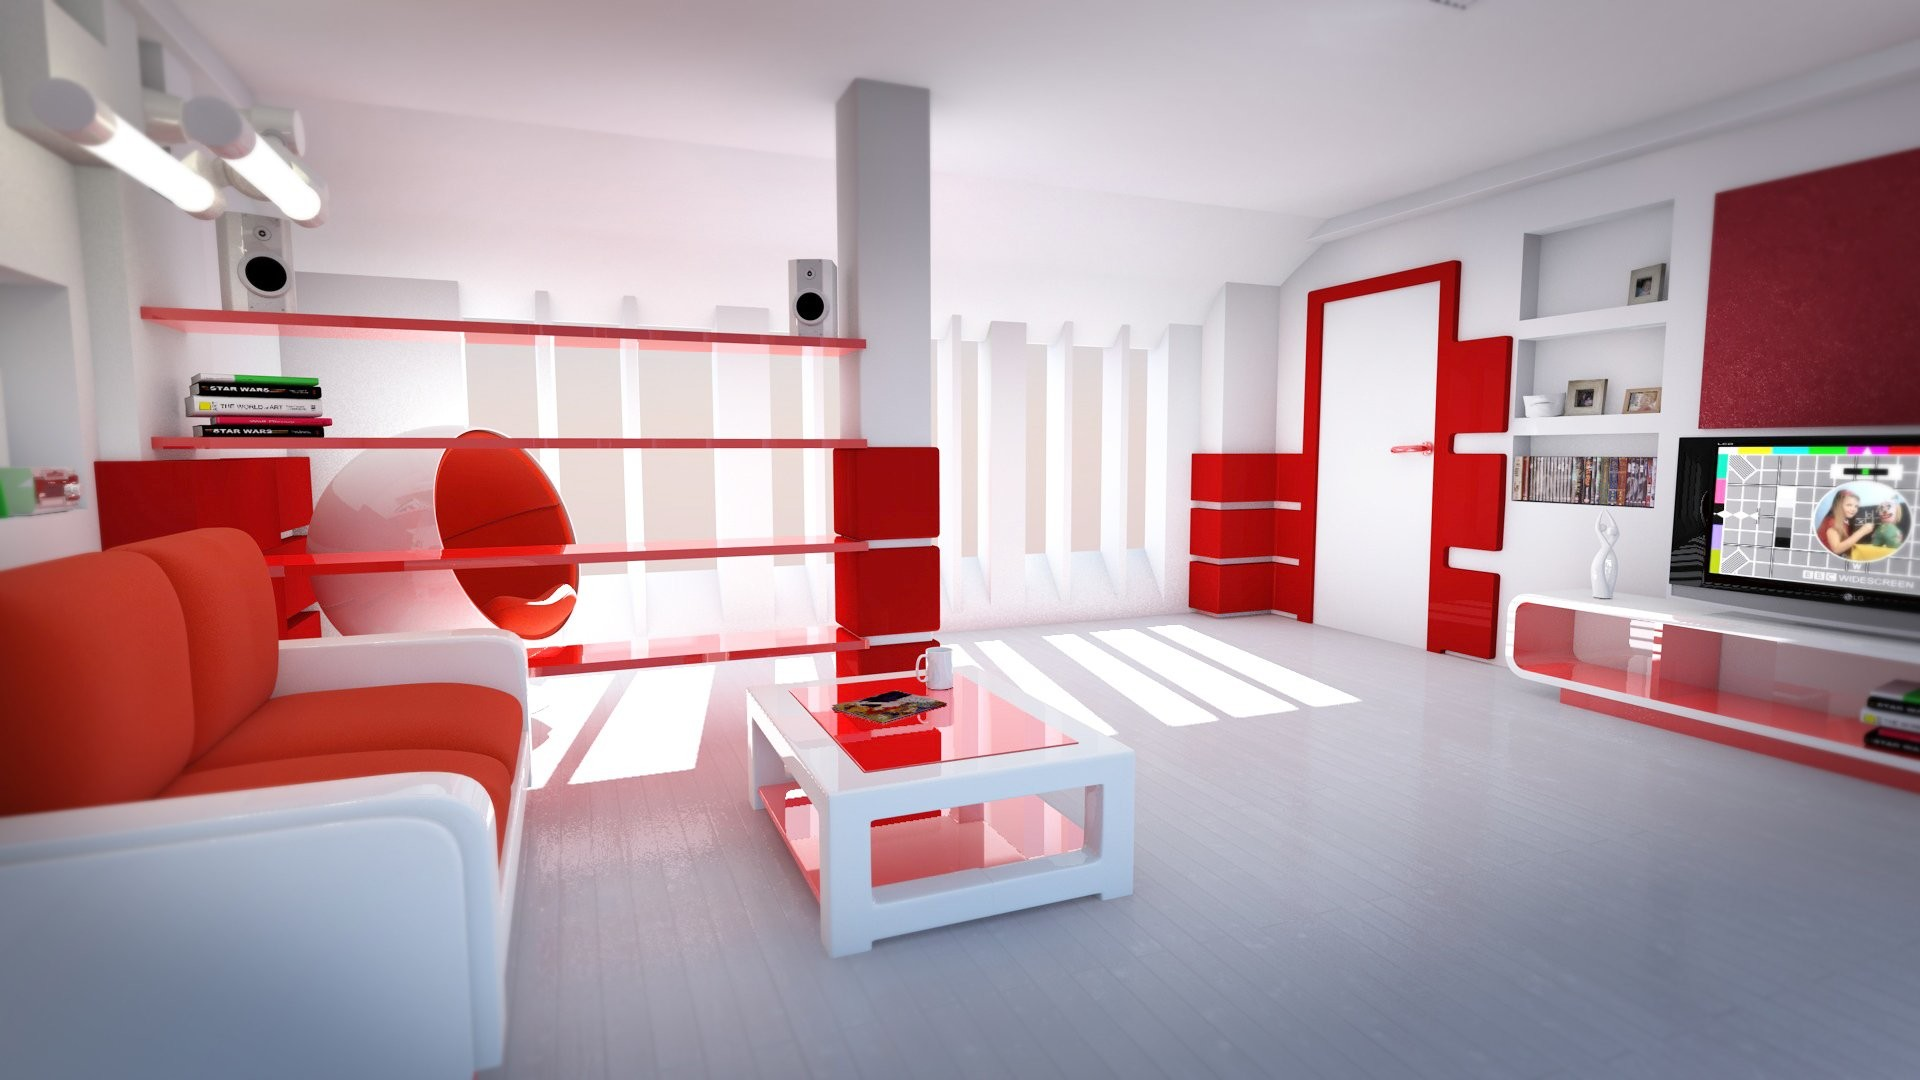 Living Room Shelves Free Desktop Background 38